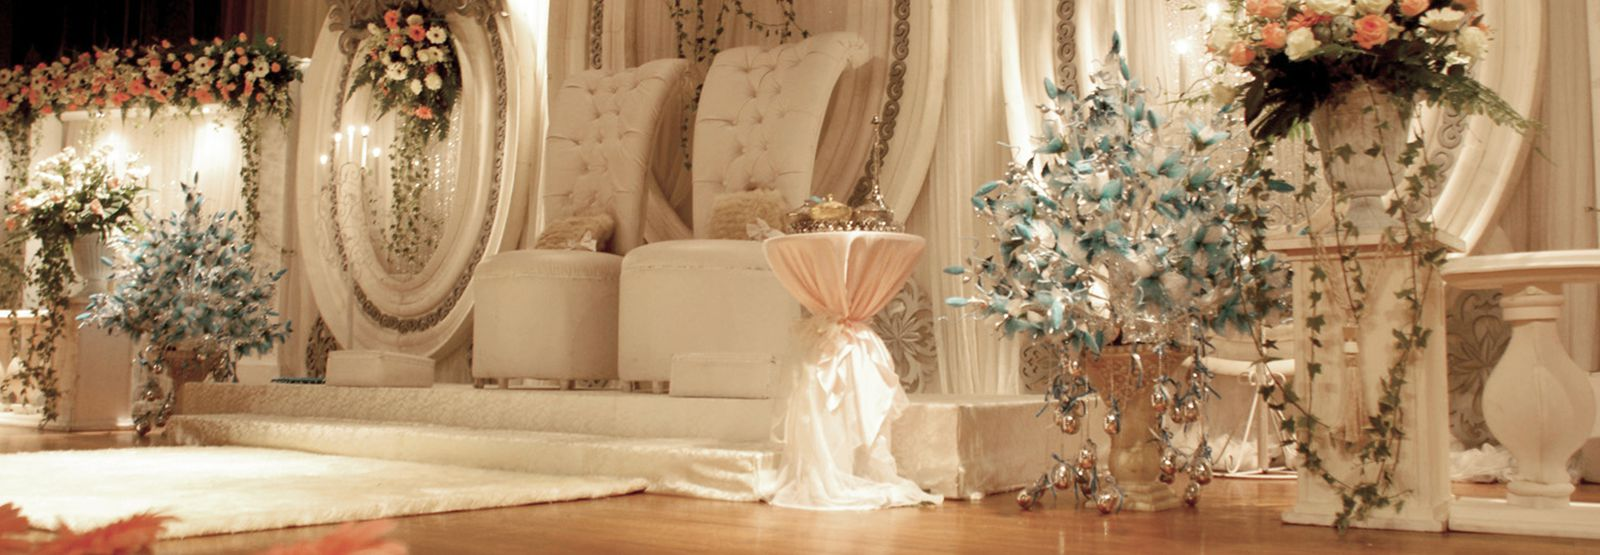 Wedding venues johor bahru berjaya waterfront johor bahru junglespirit Images